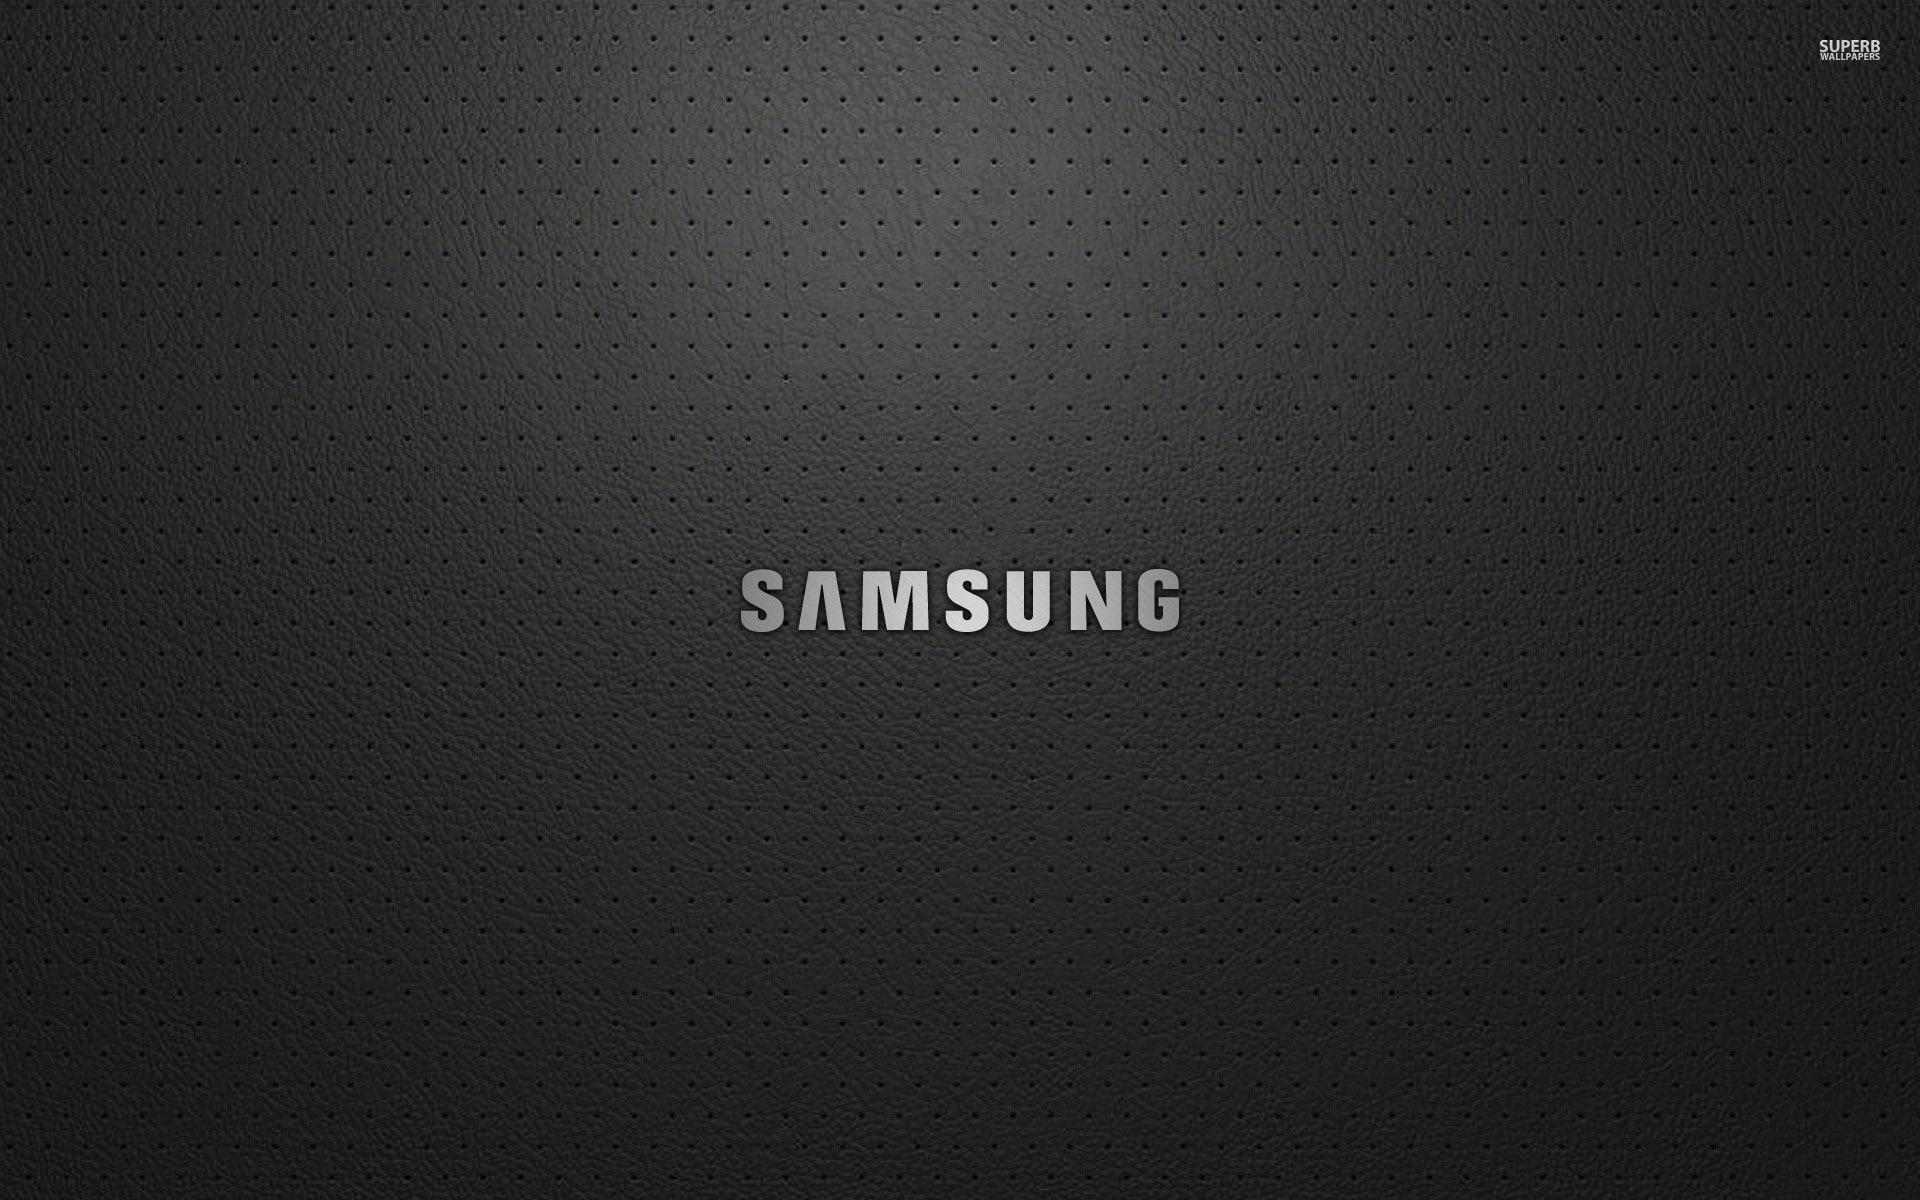 Samsung wallpaper 1920x1200 jpg